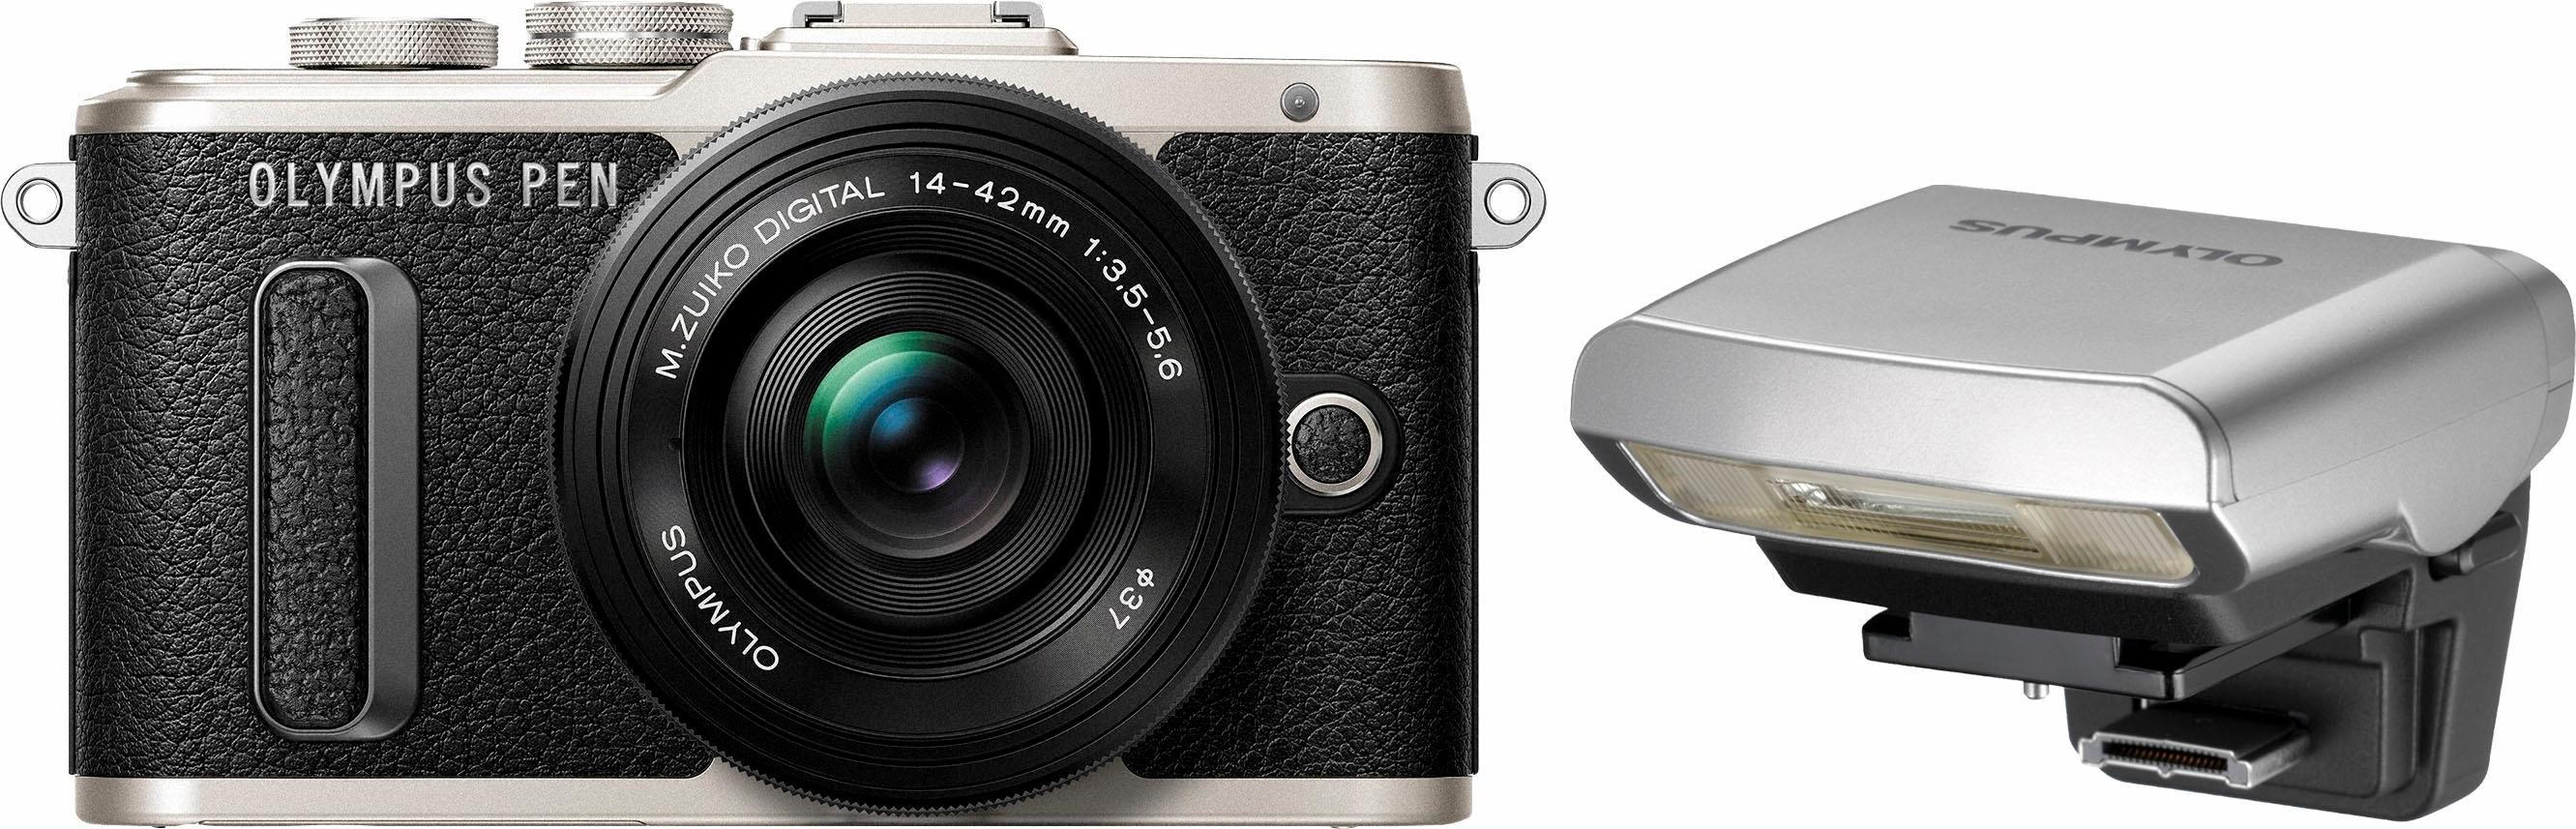 Olympus »E-PL8« systeemcamera bij OTTO online kopen